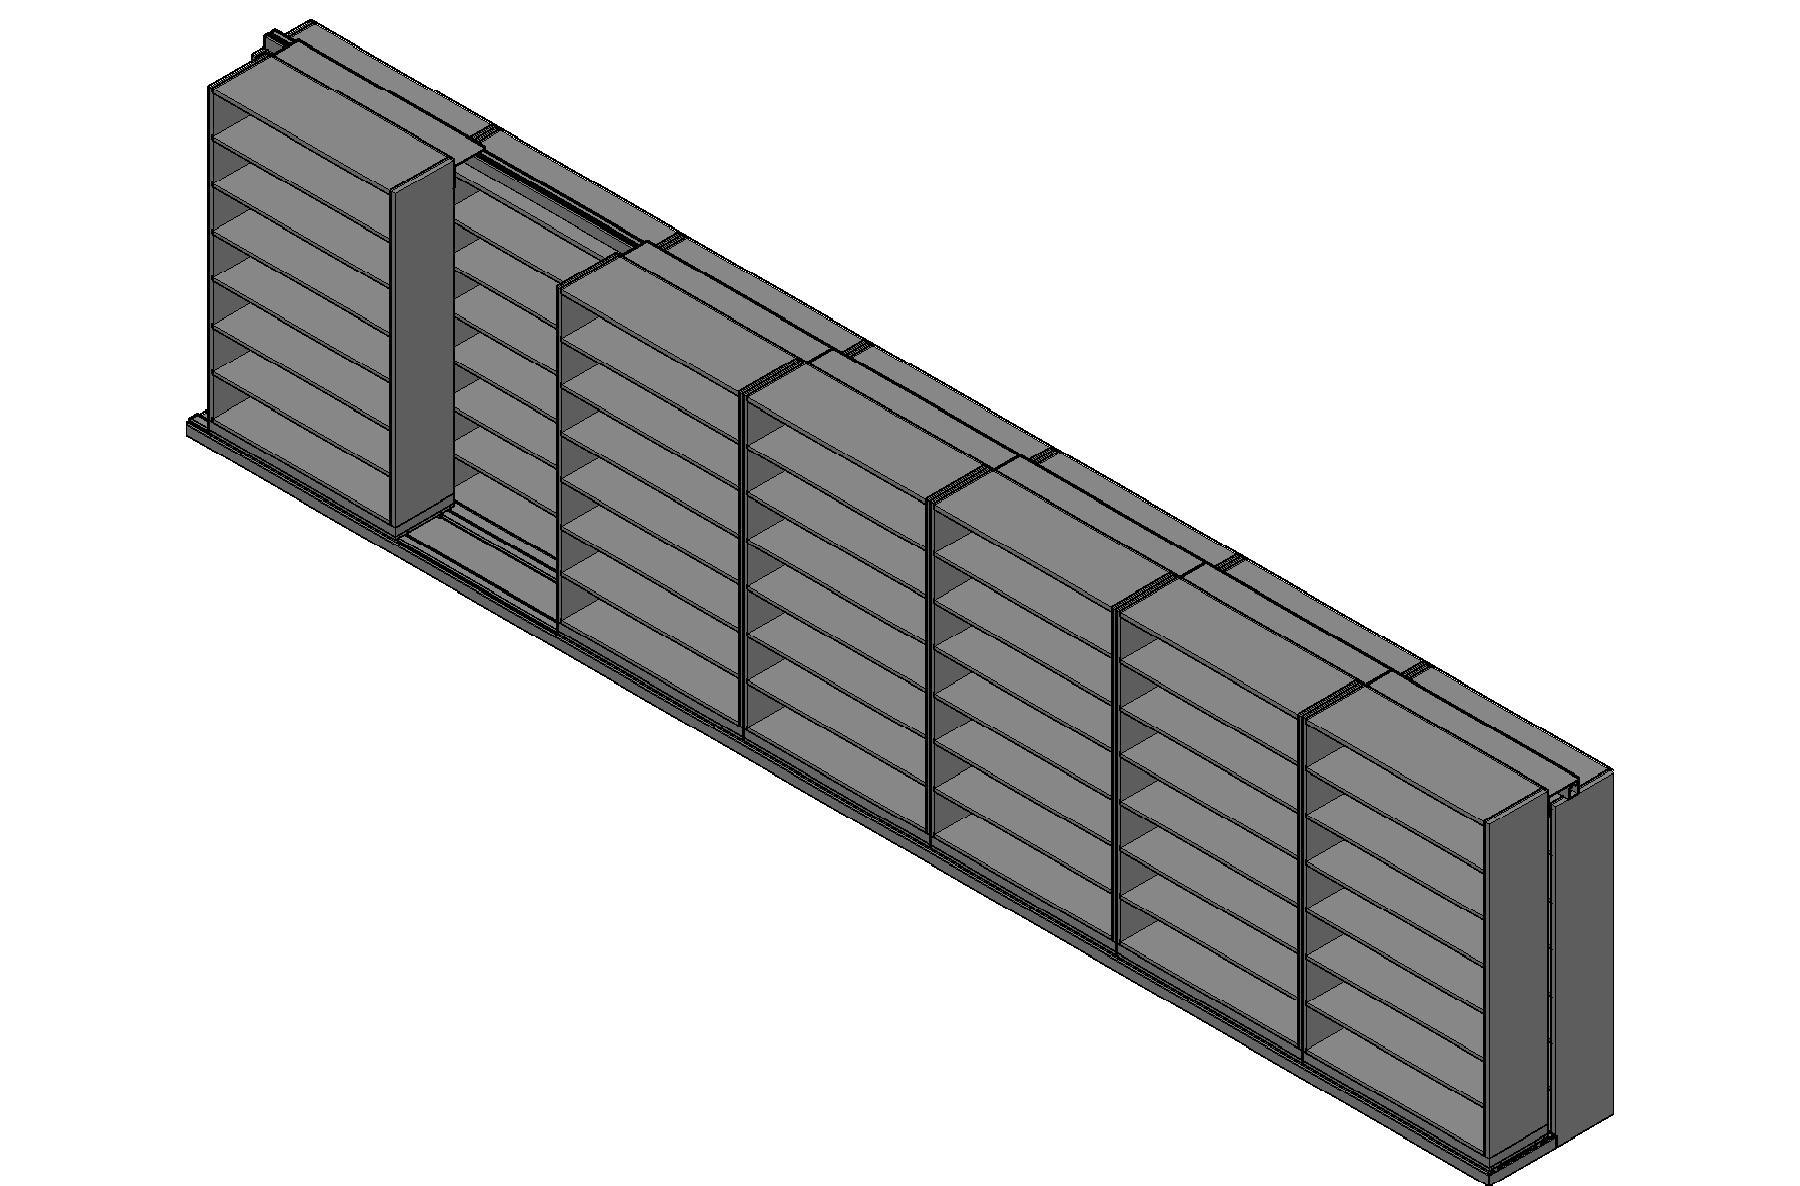 "Legal Size Sliding Shelves - 2 Rows Deep - 7 Levels - (48"" x 15"" Shelves) - 340"" Total Width"